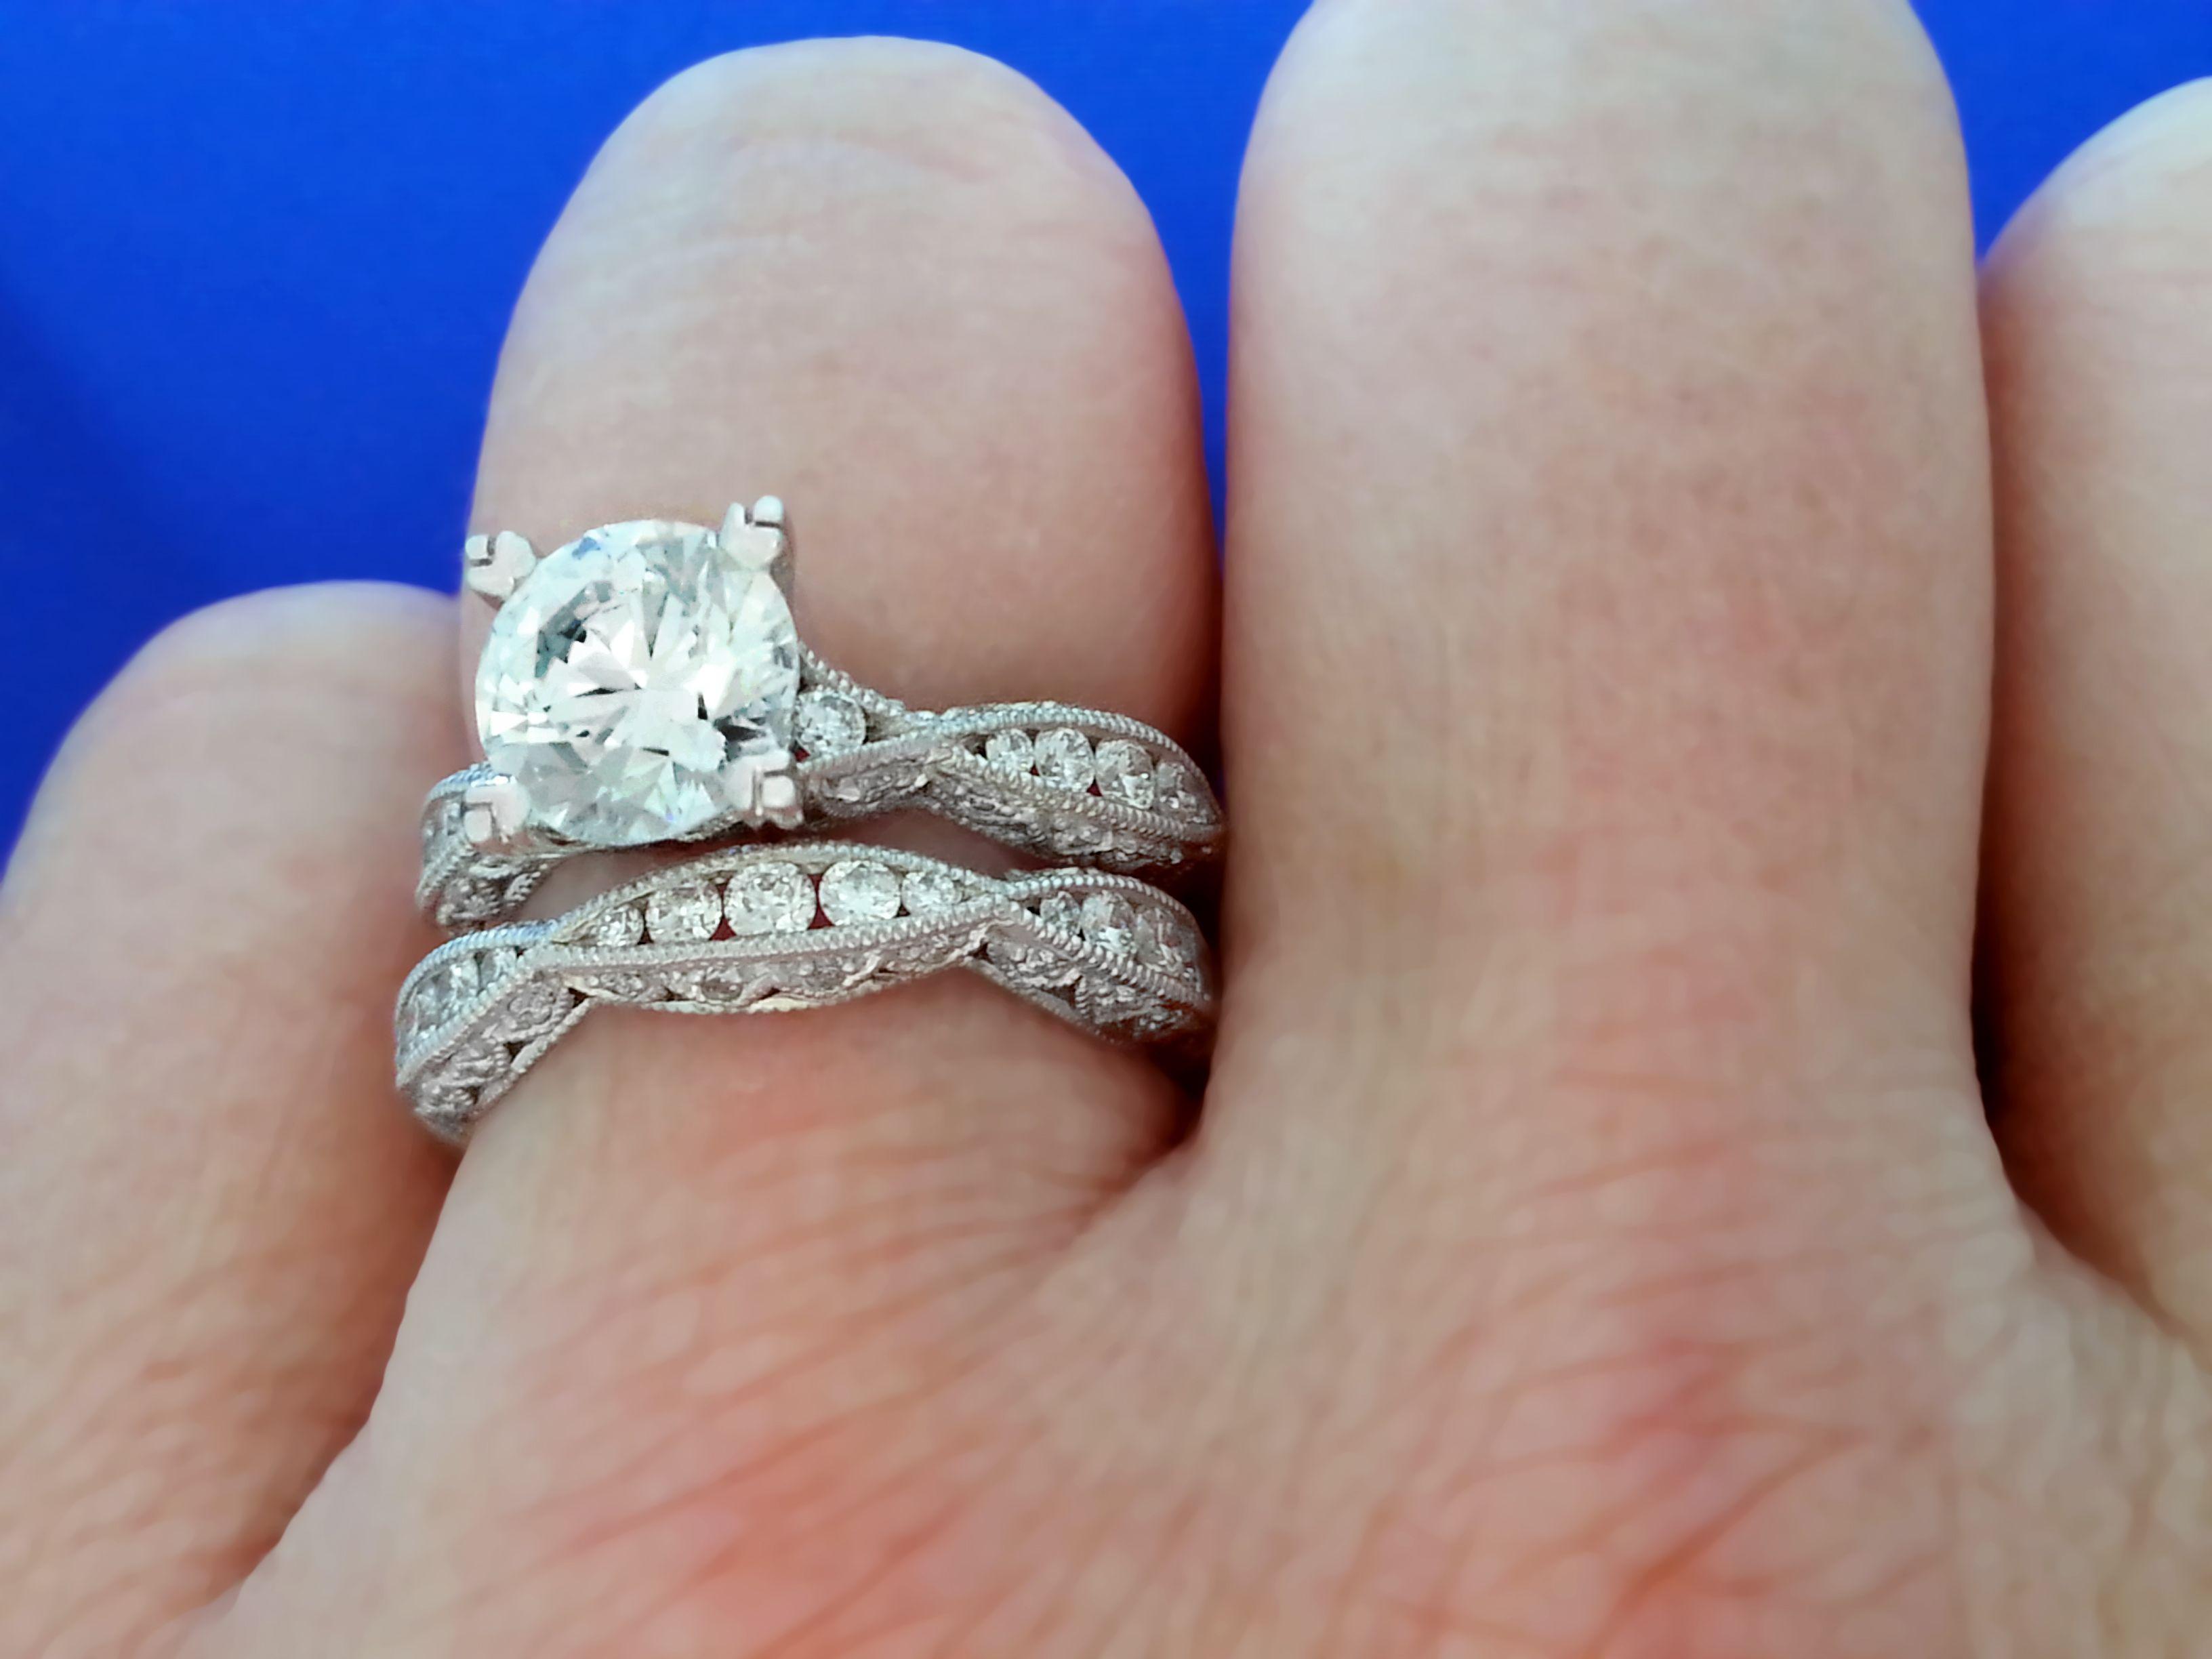 Amazing detail on this platinum tacori engagement ring and